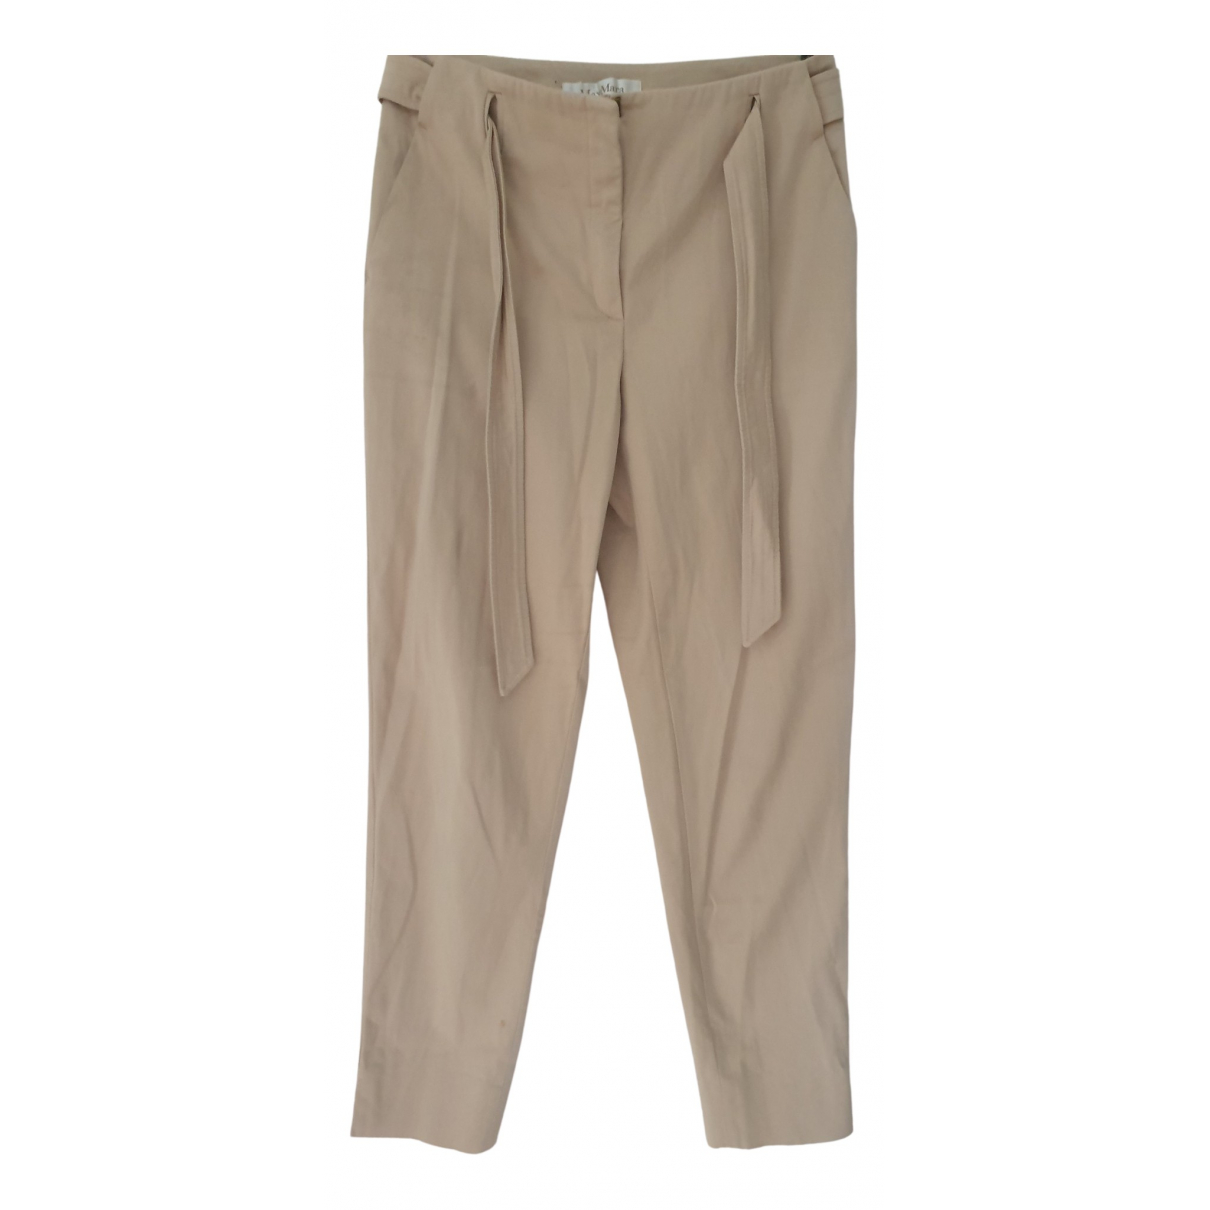 Max Mara \N Beige Cotton Trousers for Women 10 UK